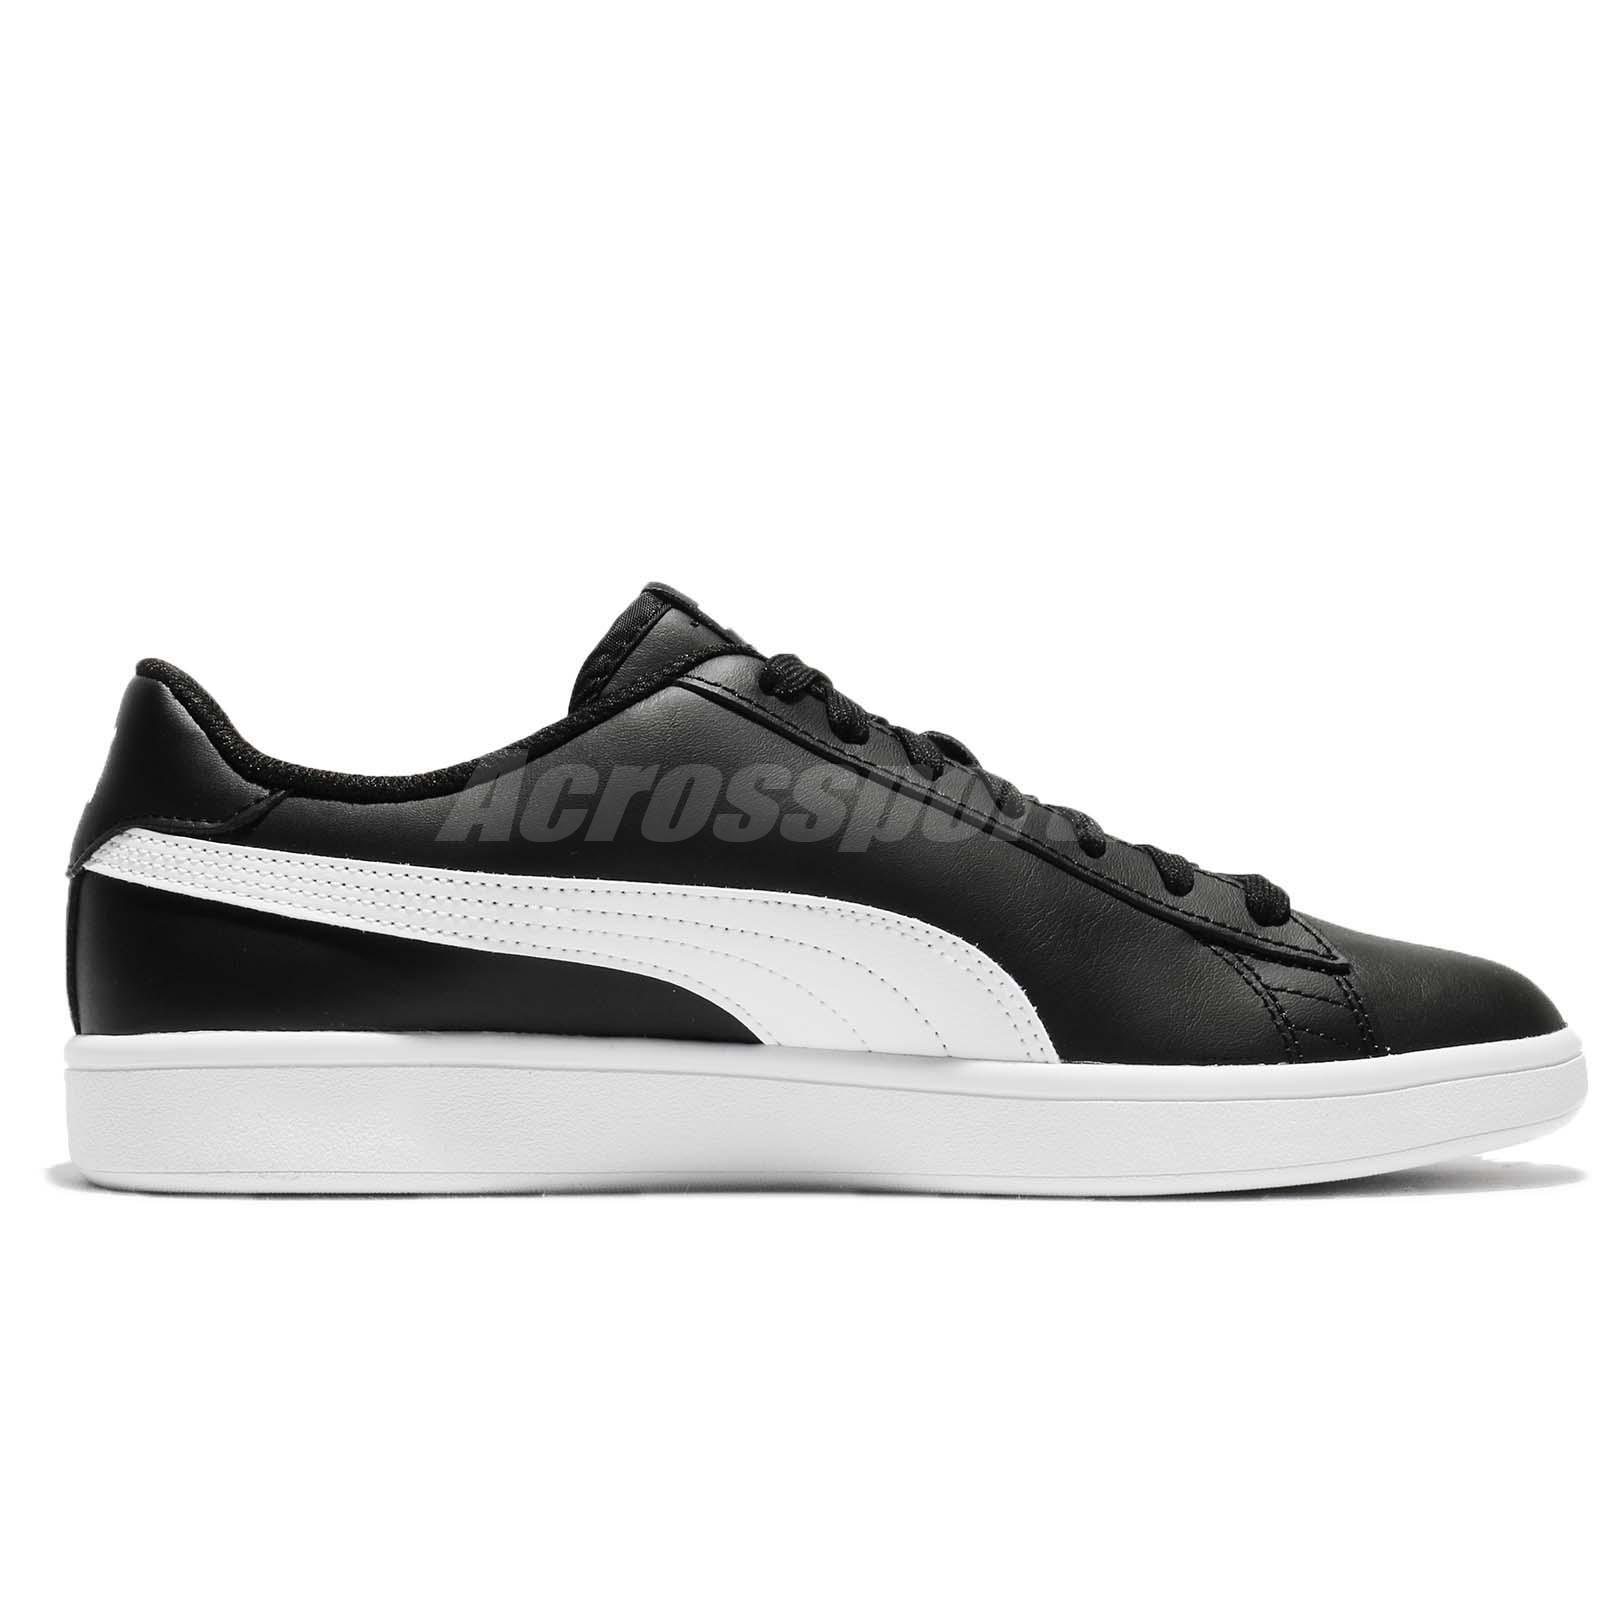 Puma Smash V2 L Black White Men Classic Shoes Sneakers Trainers ... 8d047b136